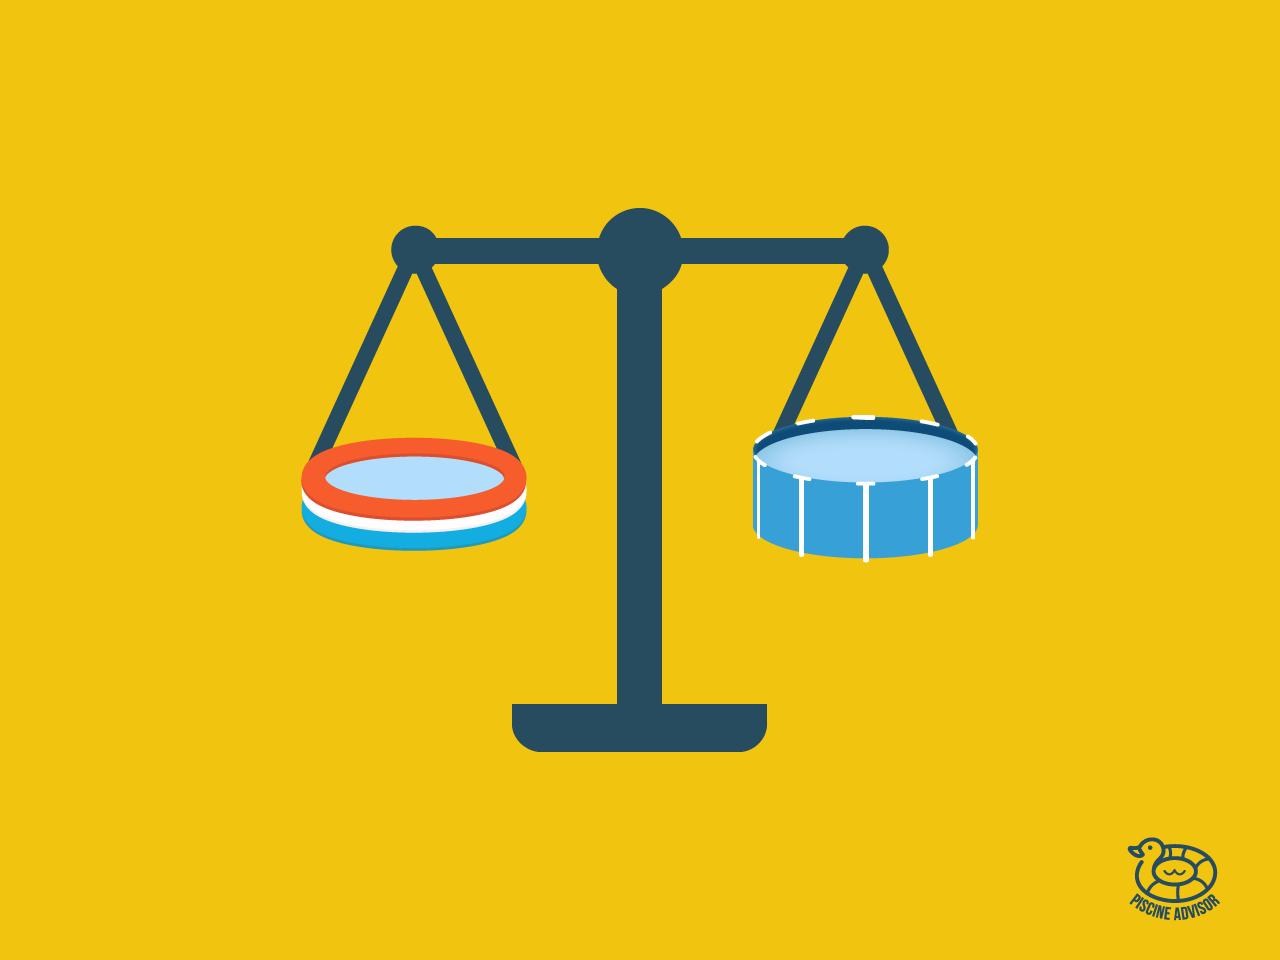 Sécurité Piscine Hors Sol: Guide Pratique - Piscine Advisor avec Legislation Piscine Hors Sol